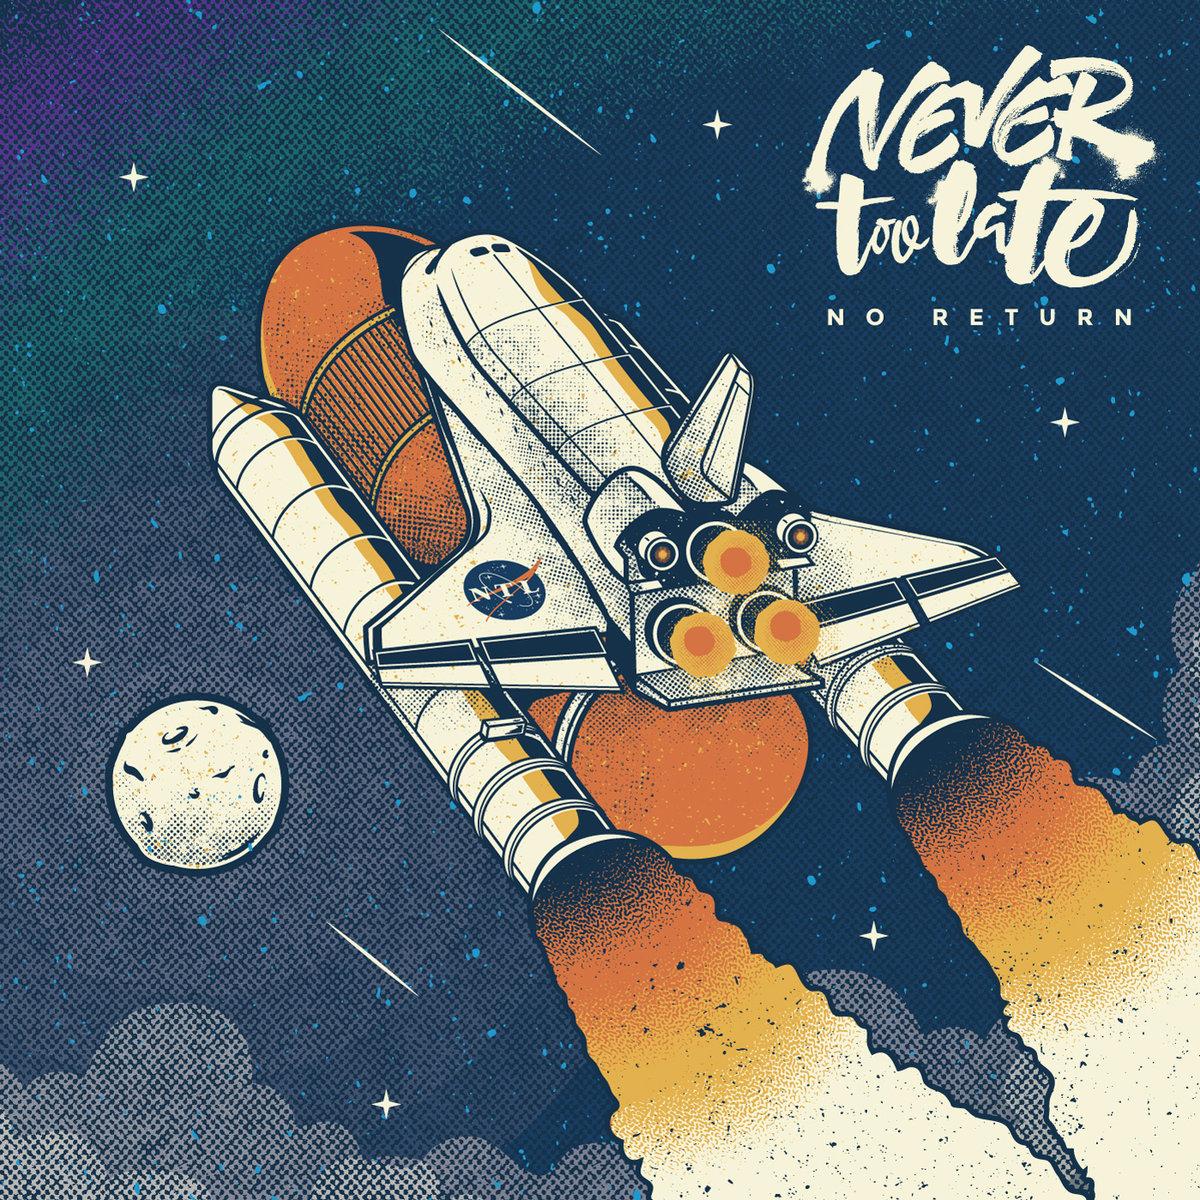 State Champs好きはぜったいハマる!ポップパンクバンド「Never Too Late」がニューアルバムをリリース!